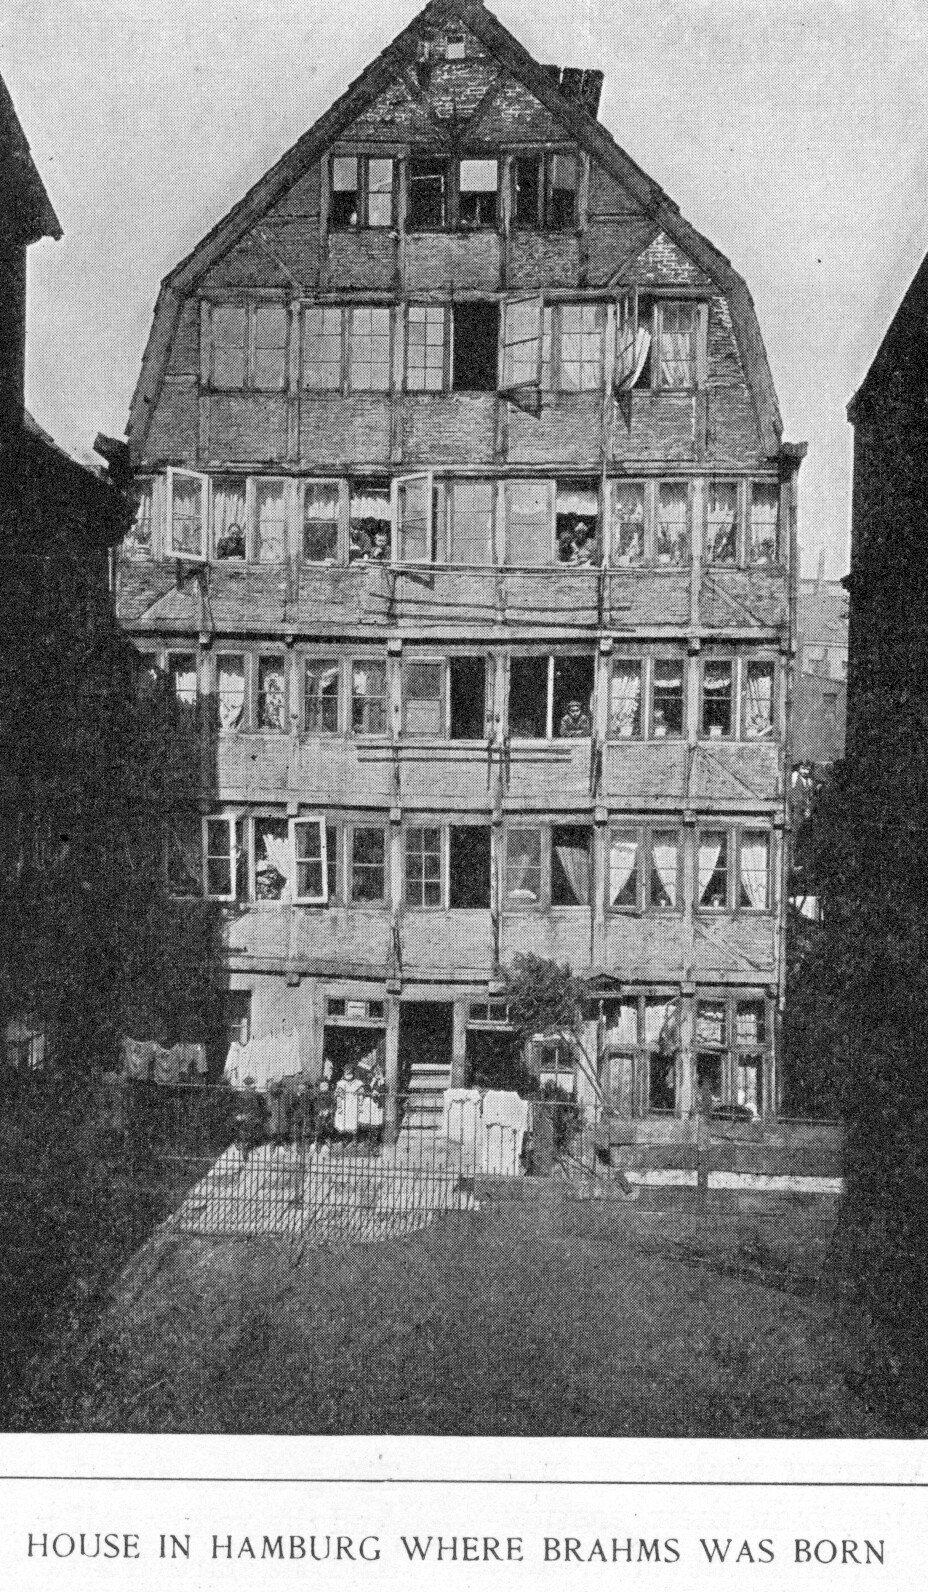 Brahms geburtshaus in Hamburg